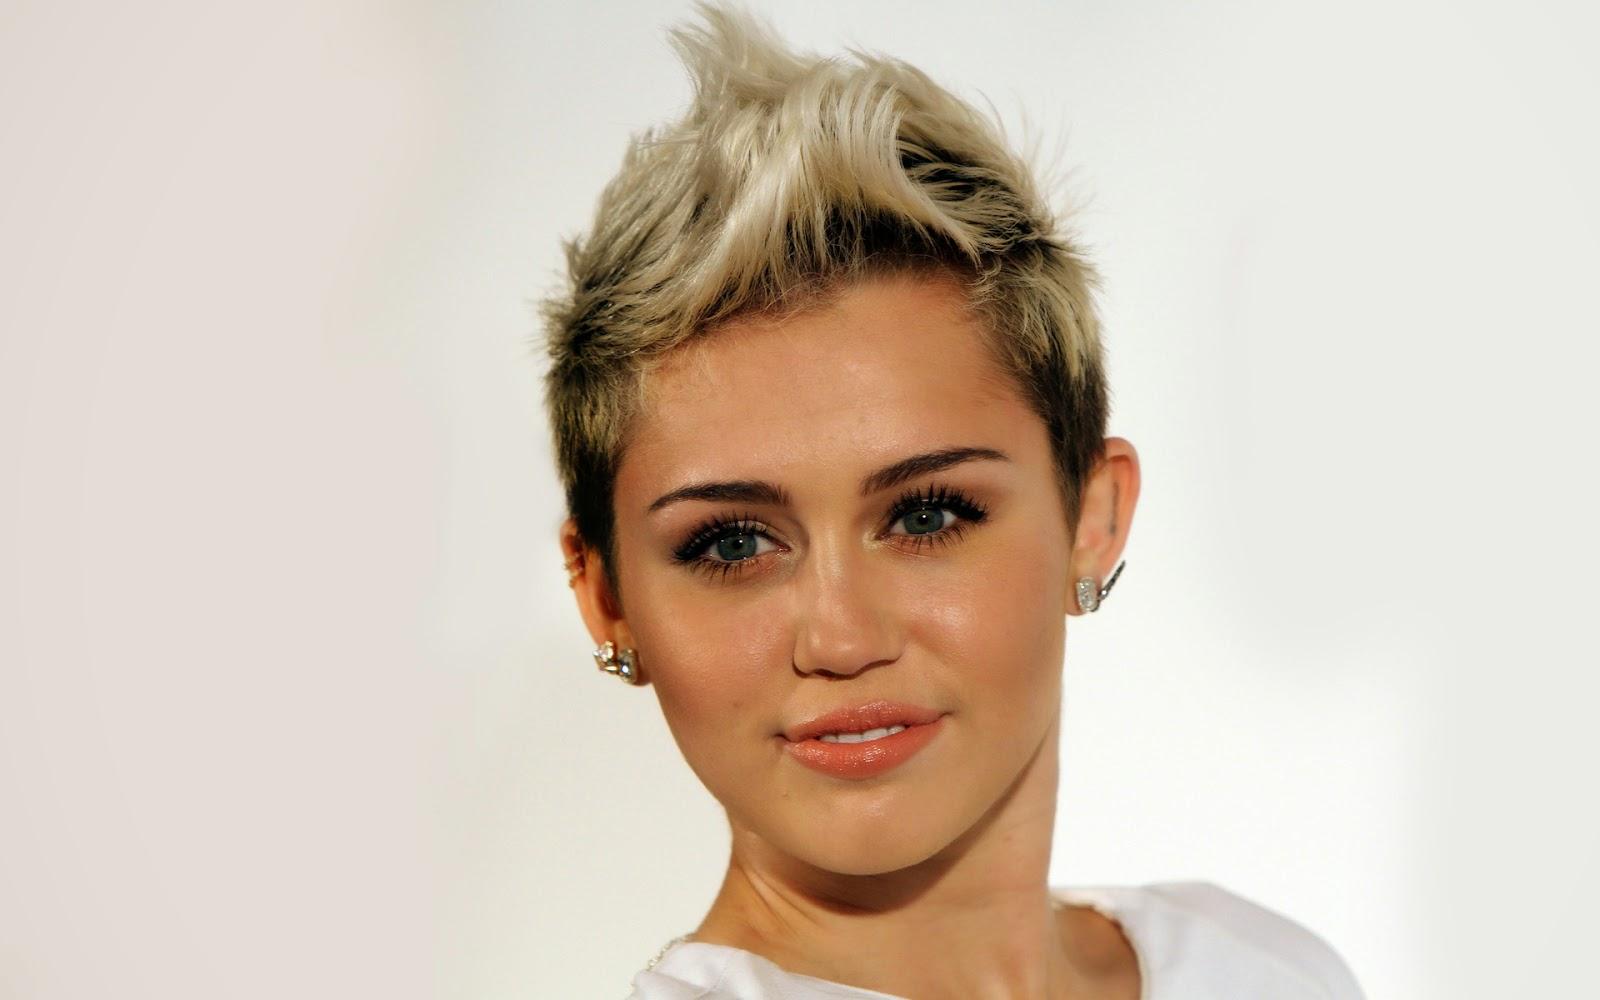 Miley Cyrus 2015 Wallpaper HiresMOVIEWALLcom 1600x1000